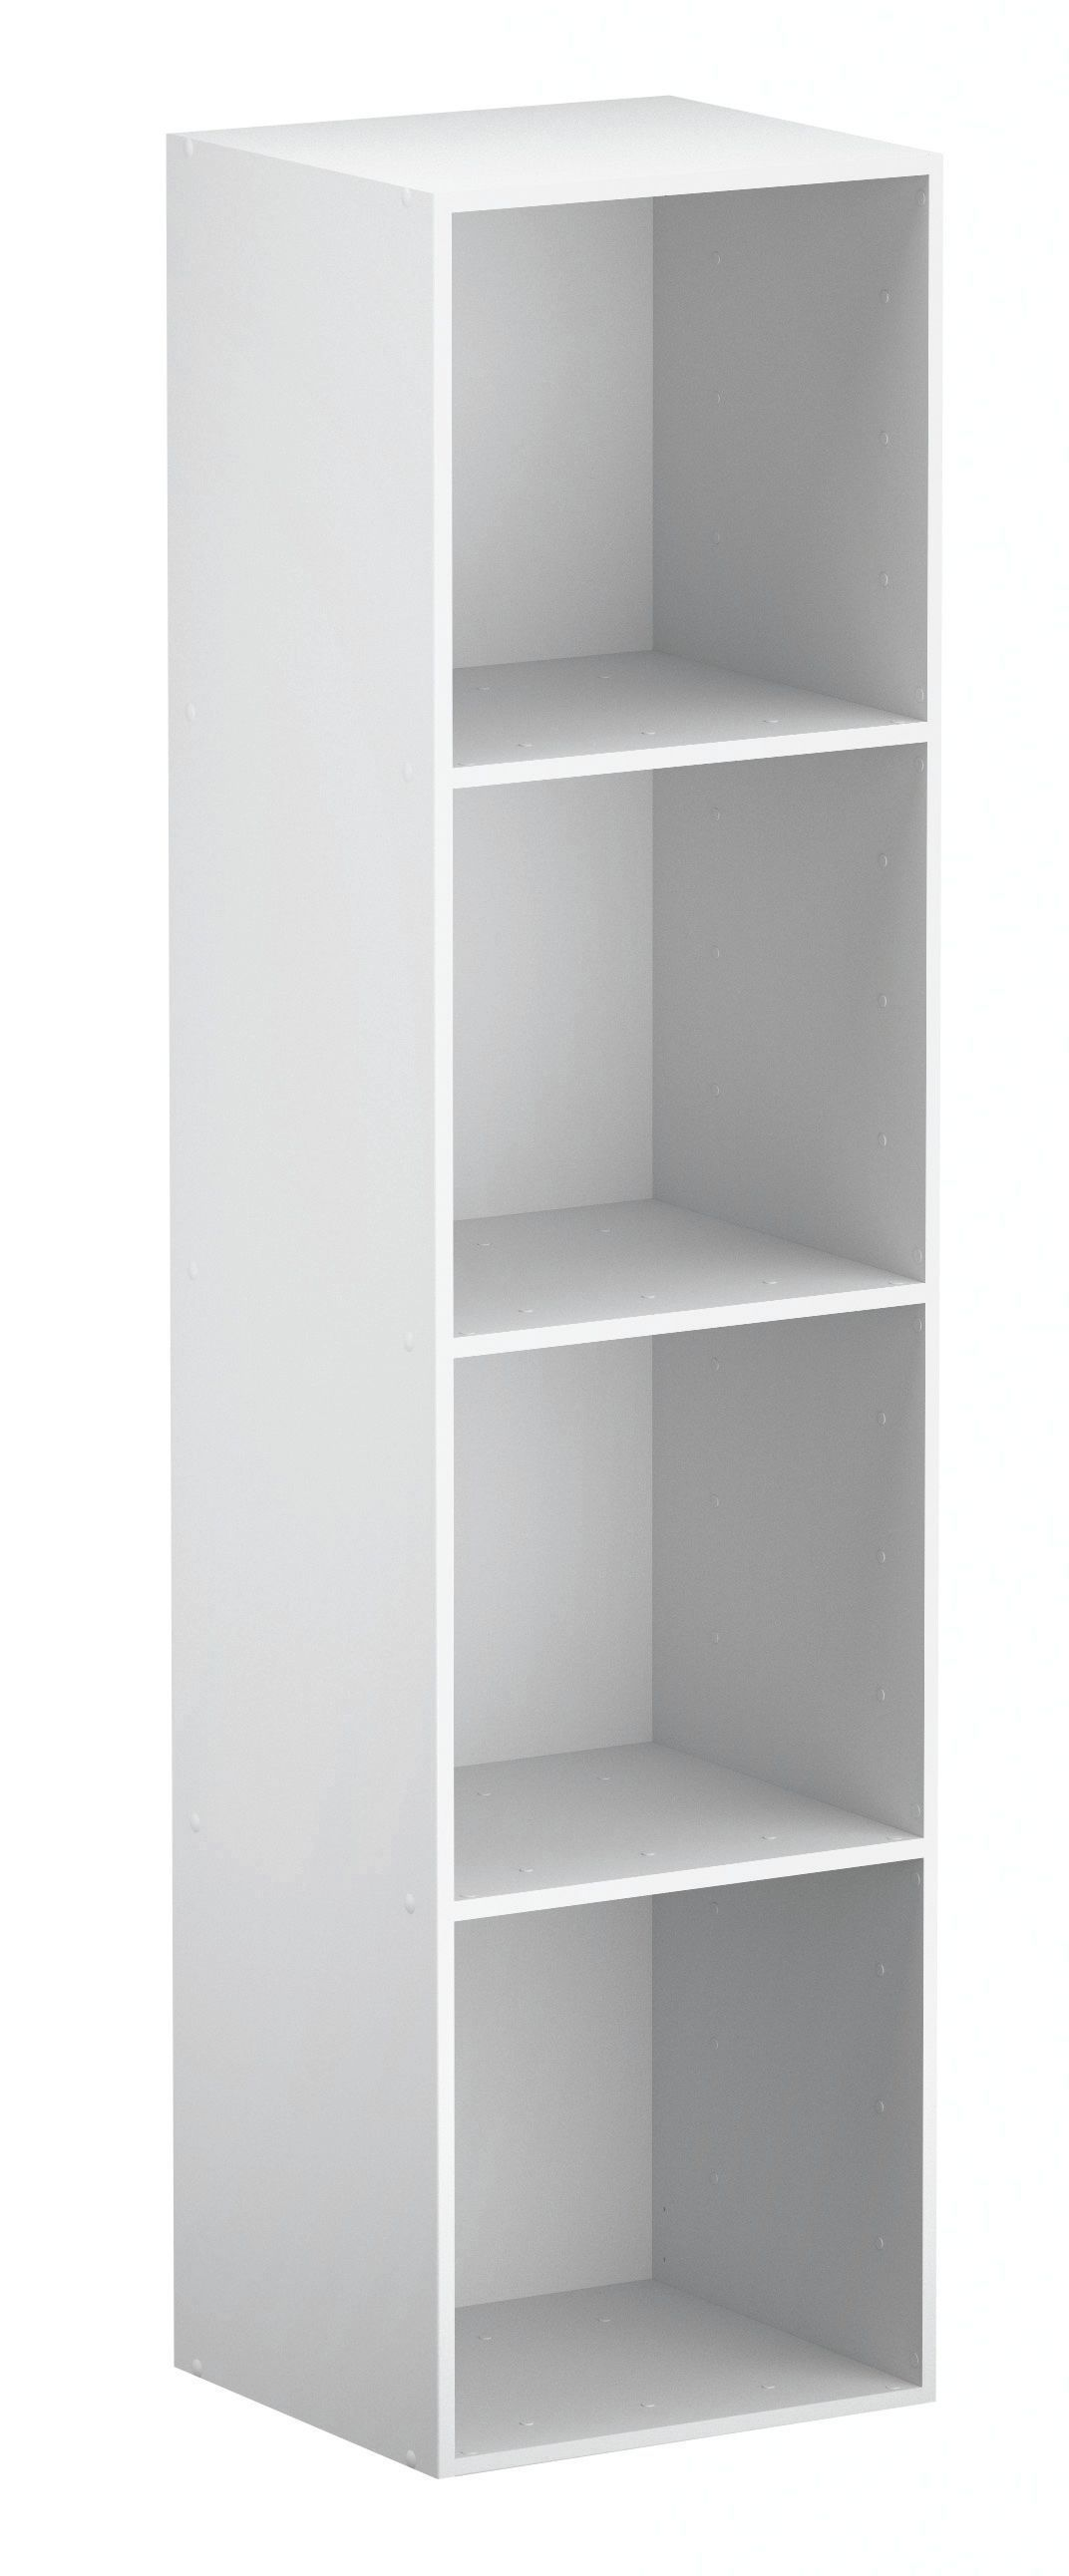 Form Konnect White 4 Cube Shelving Unit (H)1372mm (W)352mm